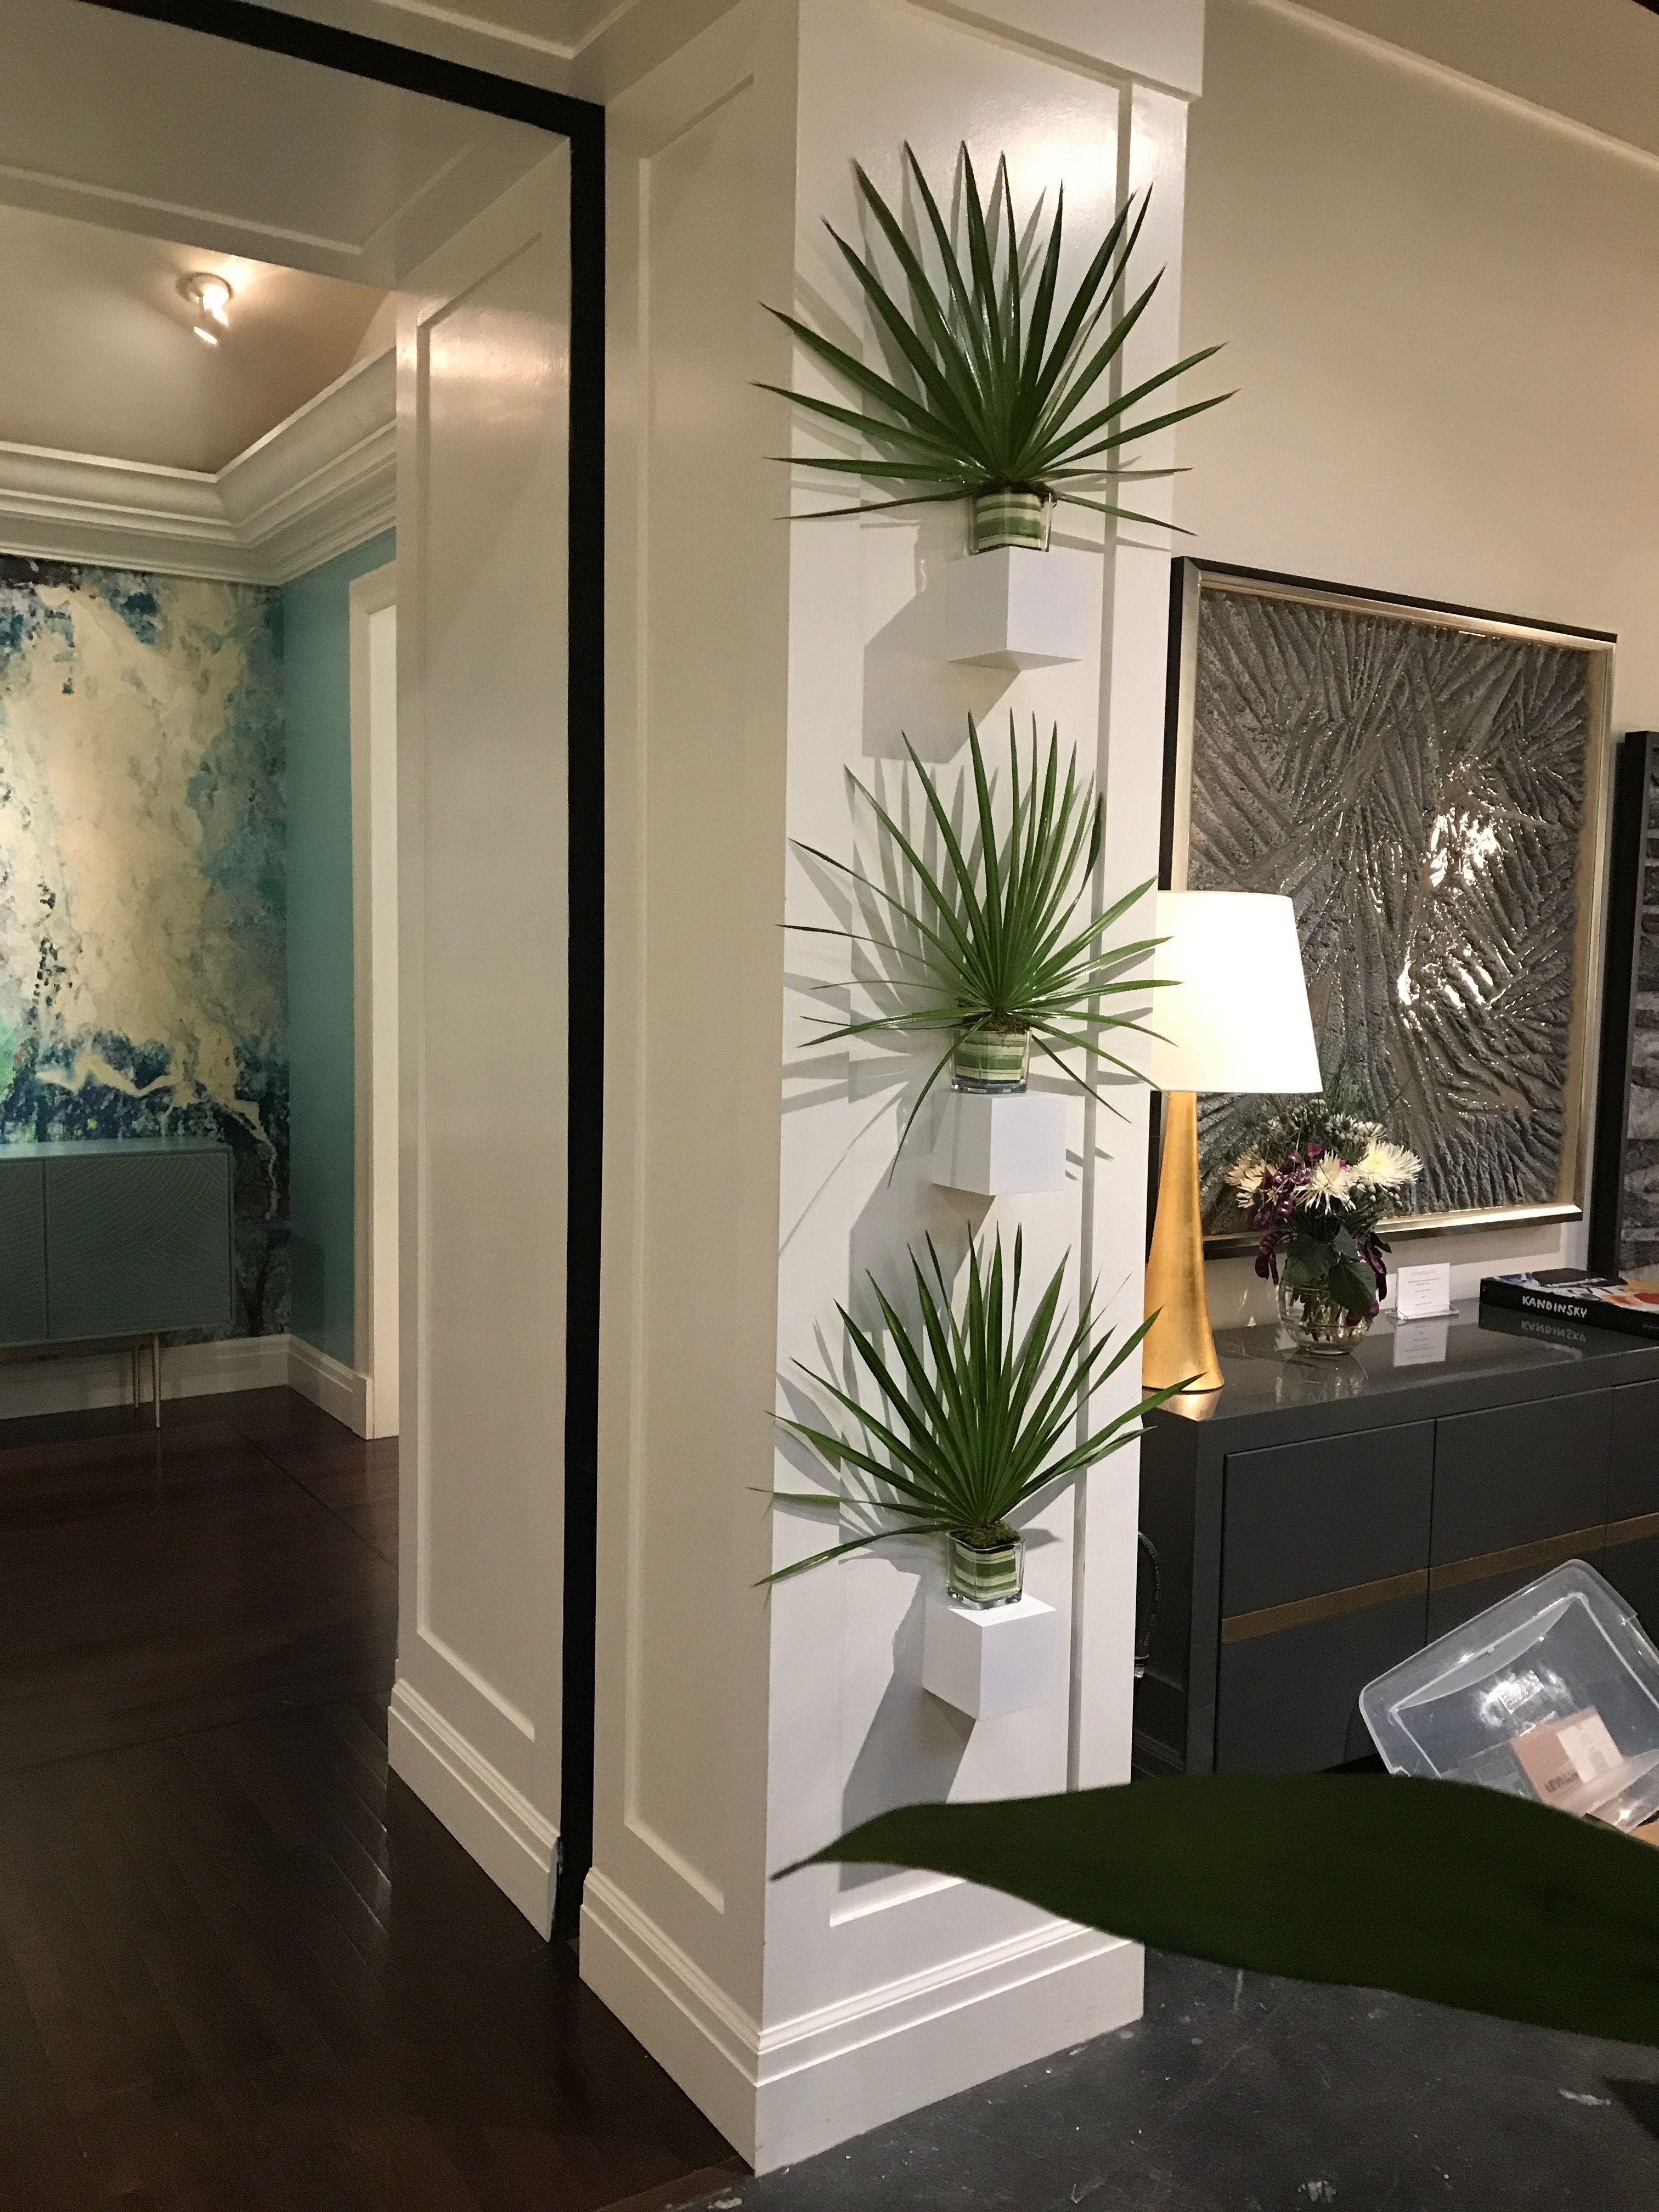 Model lemari partisi penyekat ruangan divider living room designs home decor also rh pinterest